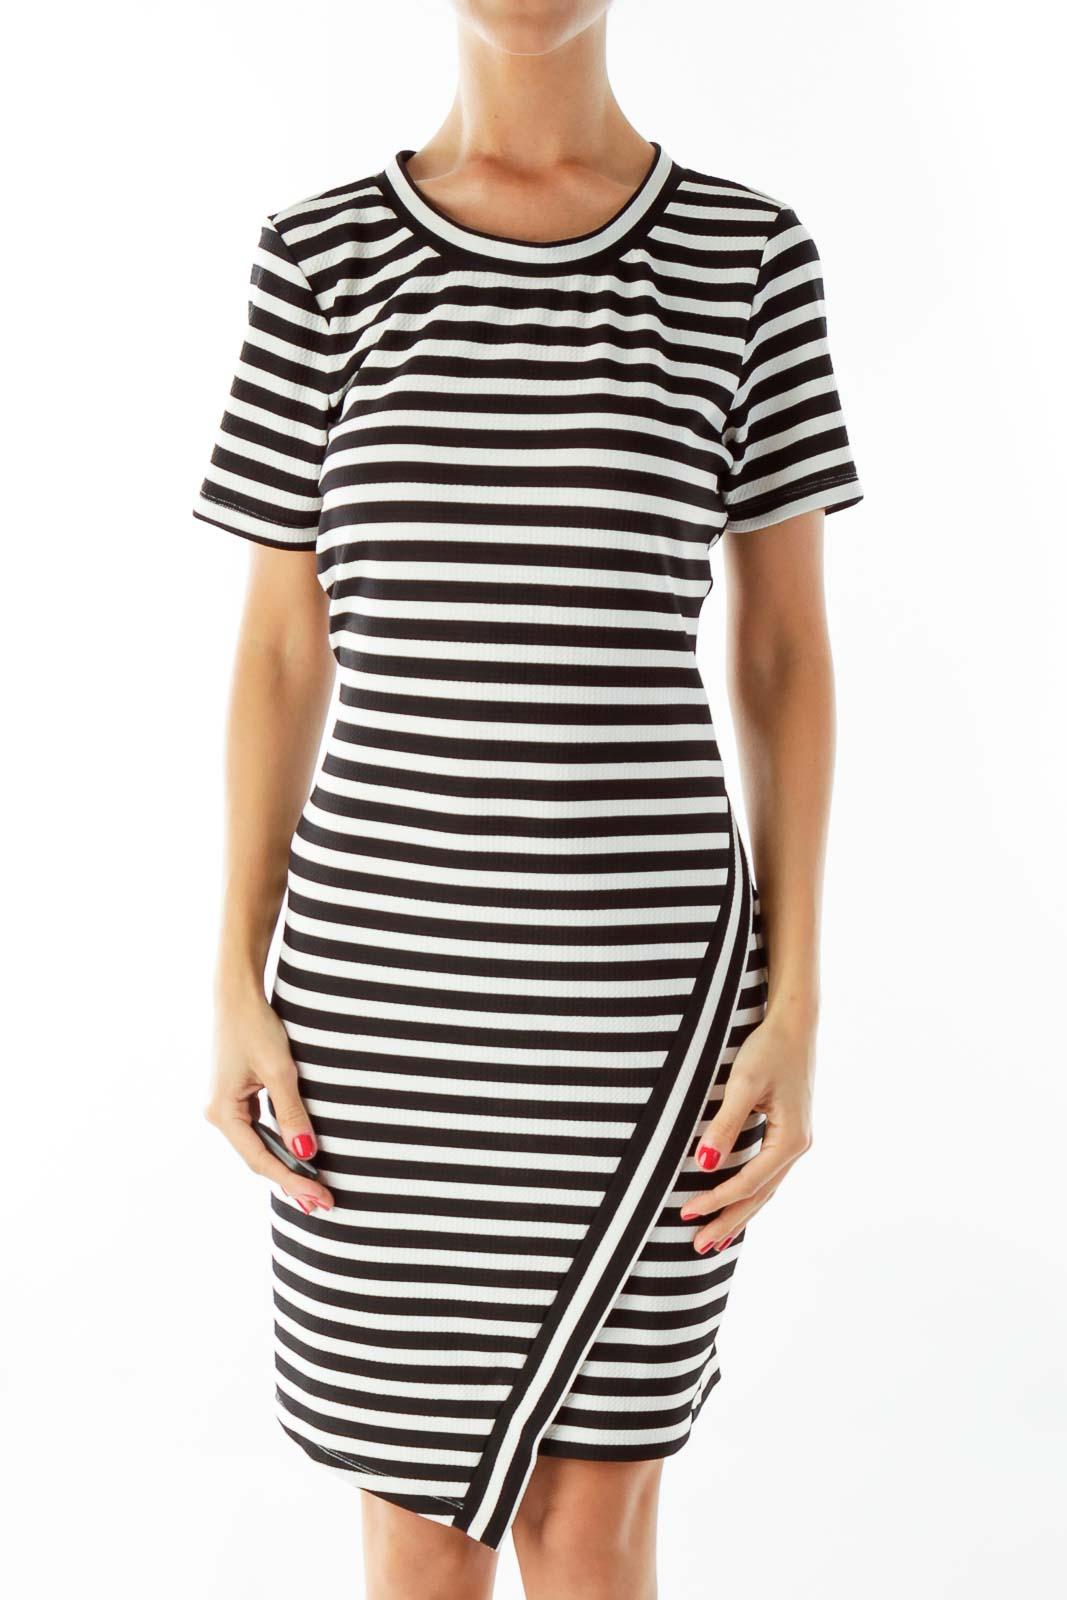 Black & White Striped Dress Front